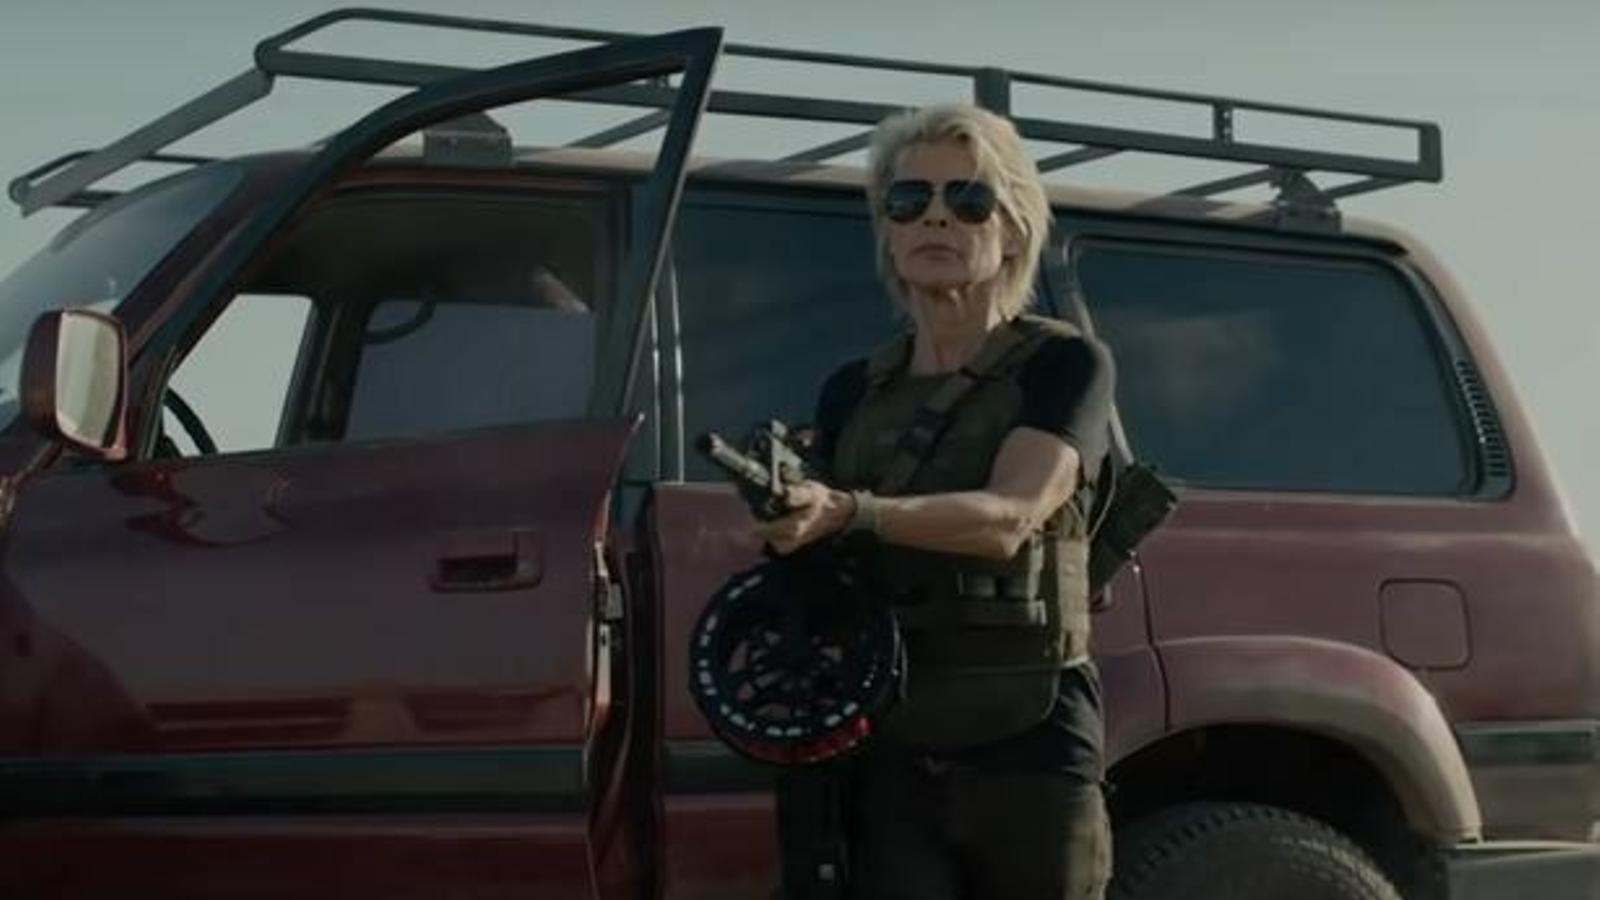 Tornen Terminator i Sarah Connor: tràiler del sisè film de la saga